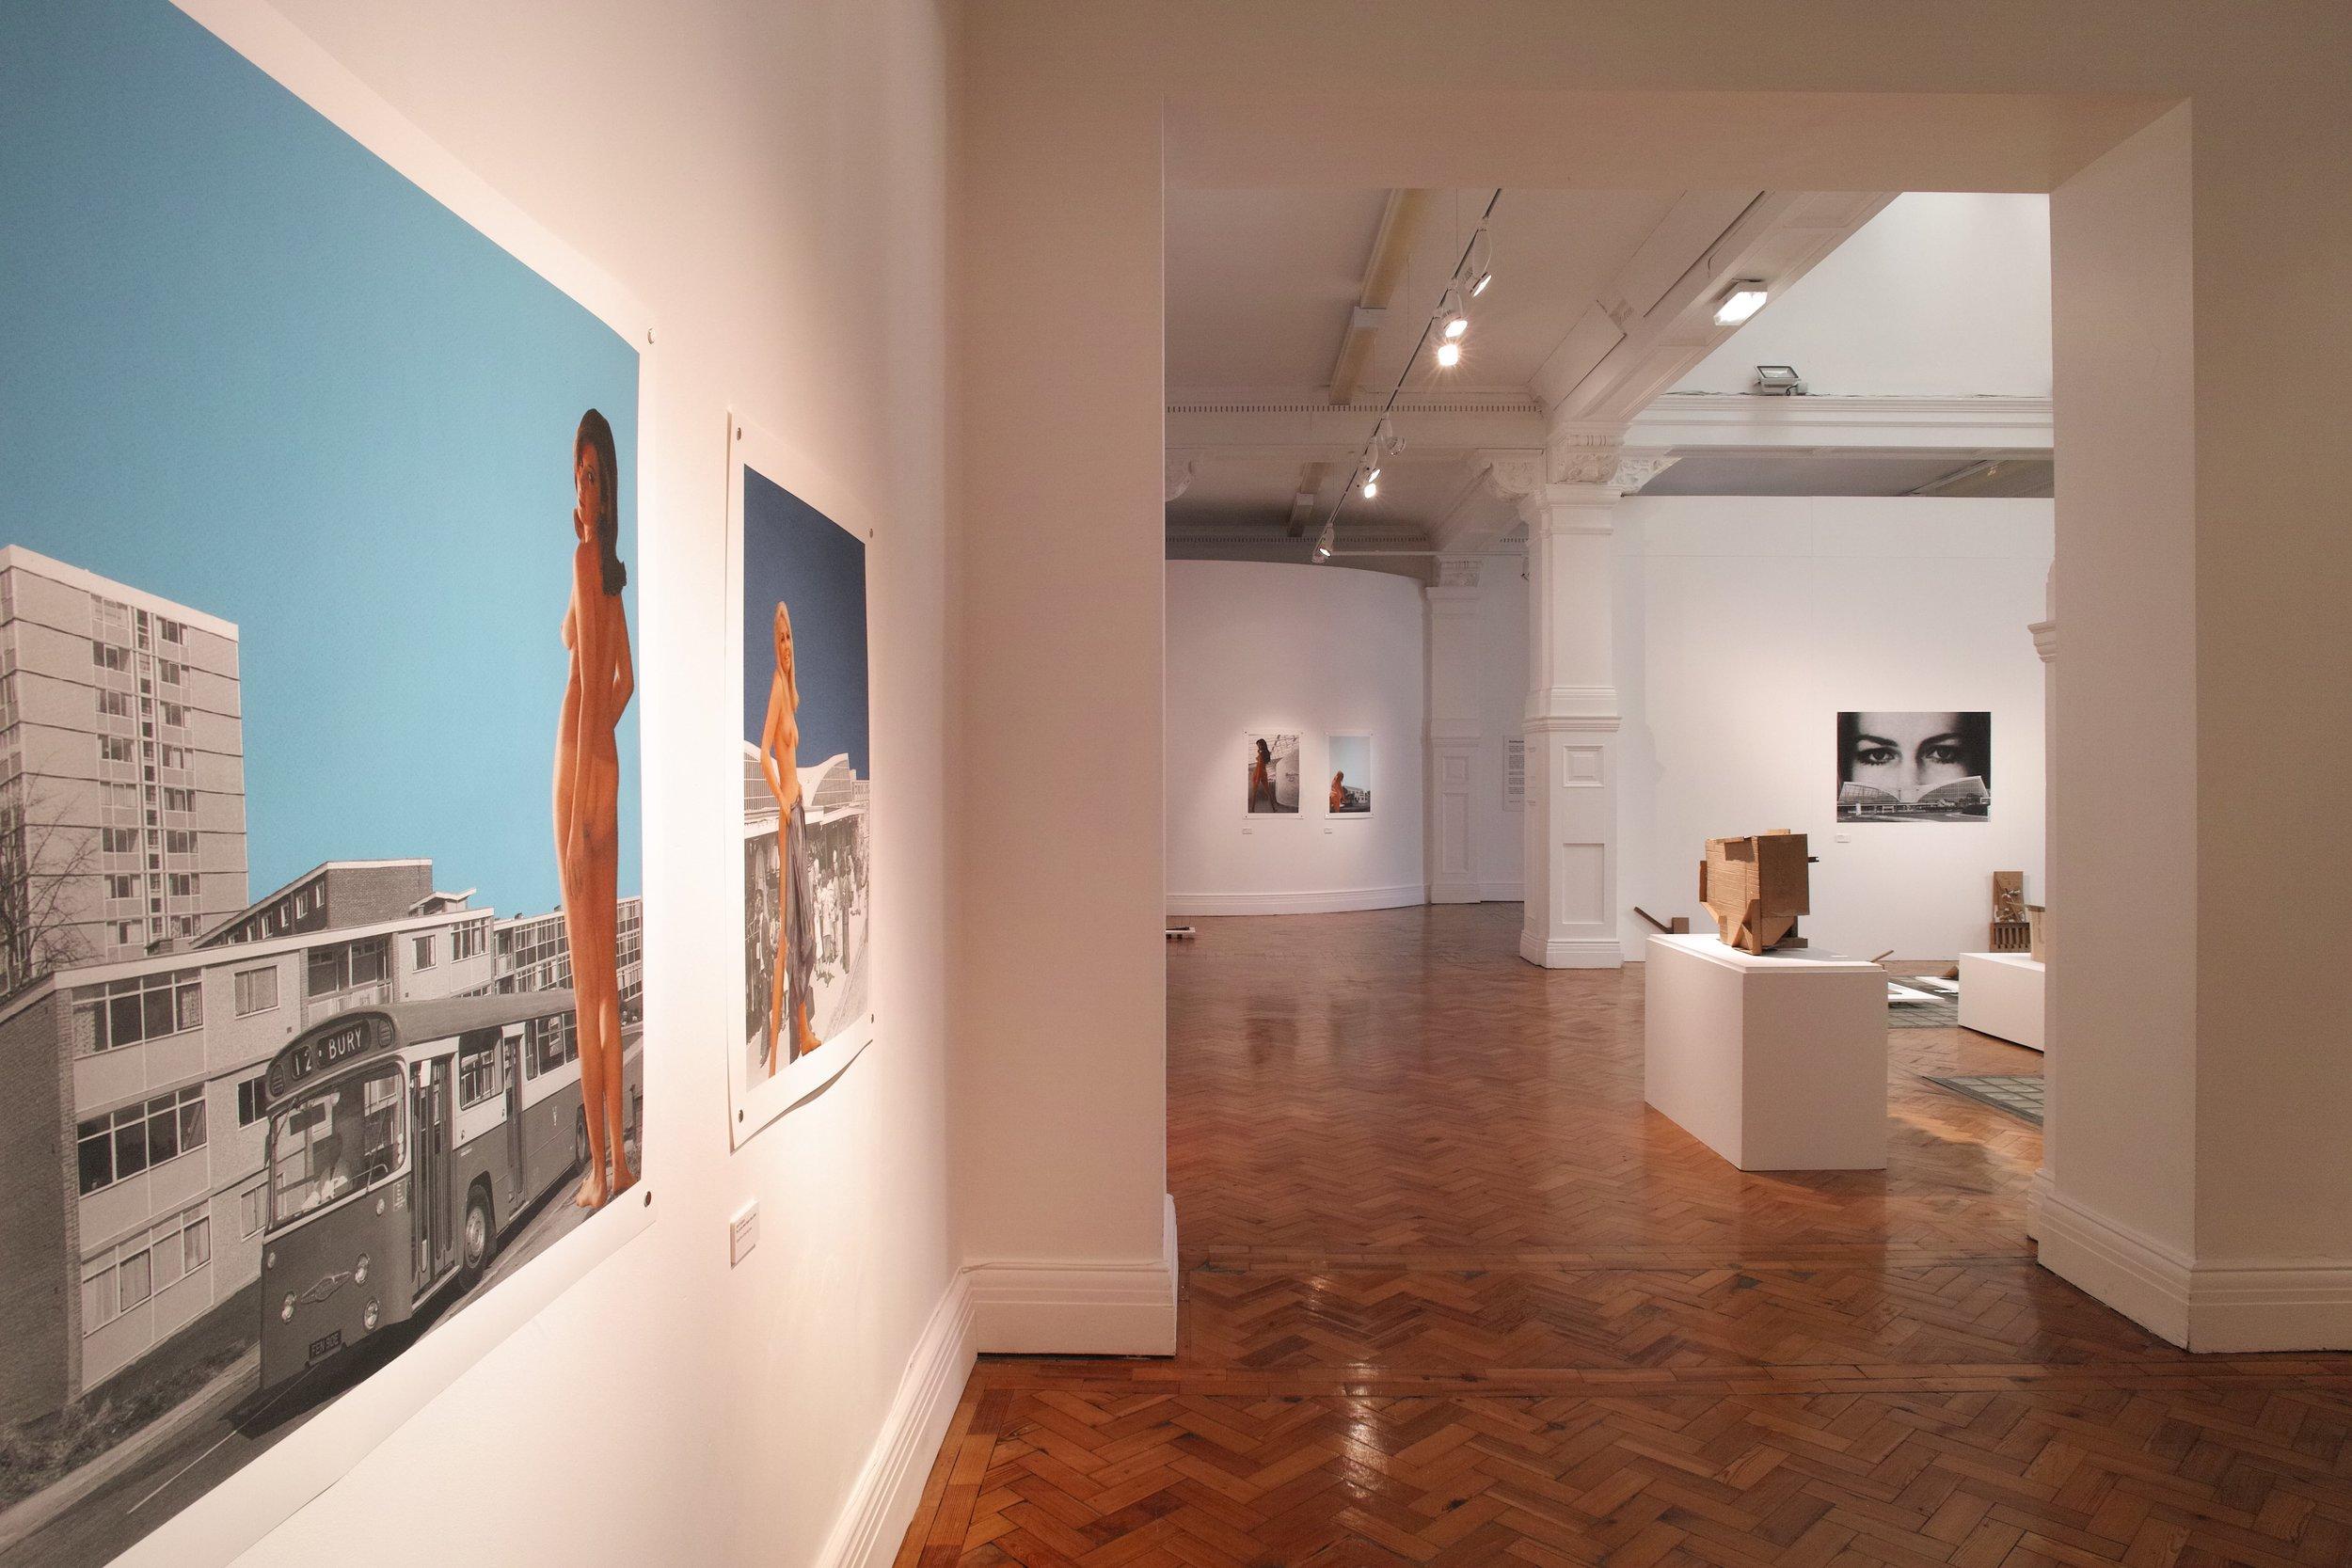 Architecture Now (install shot) at Bury Art Museum & Sculpture Centre, 2019